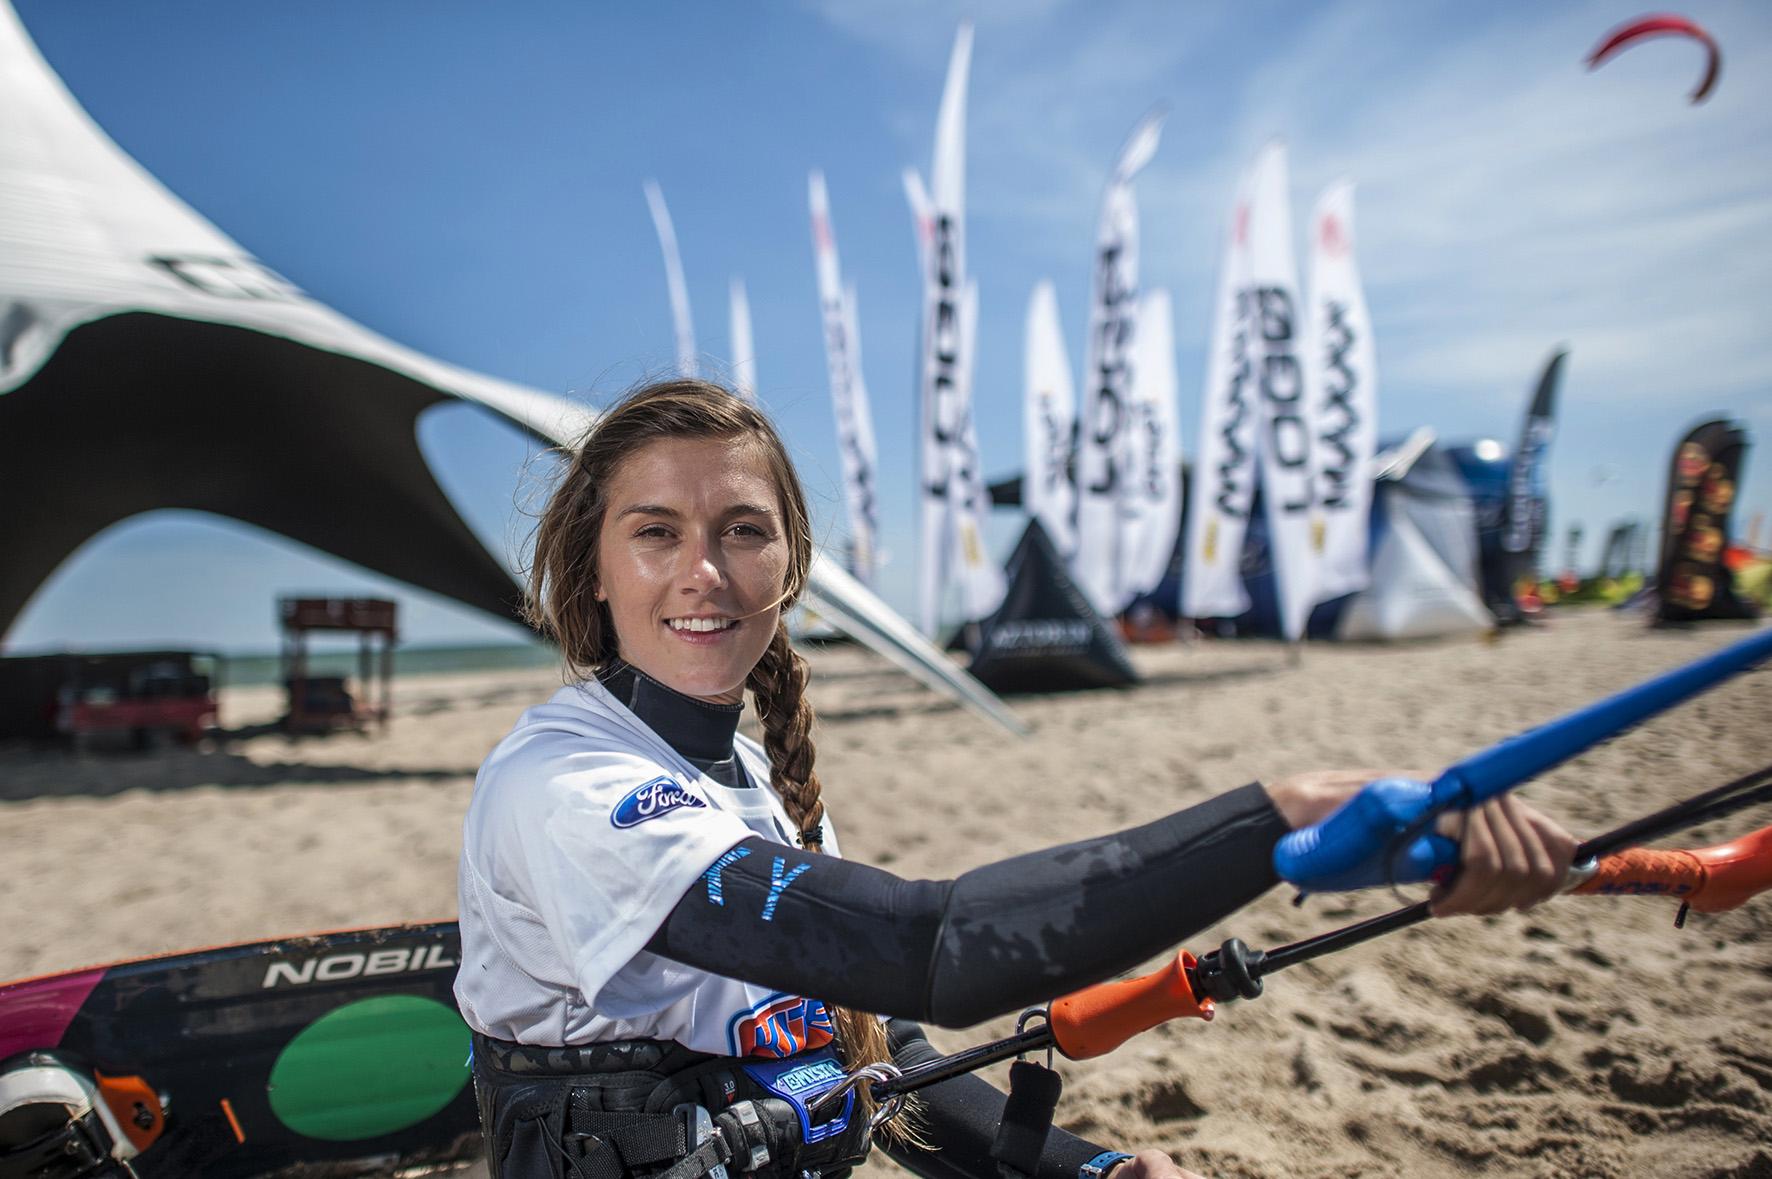 FKC zawody- Kasia Lange